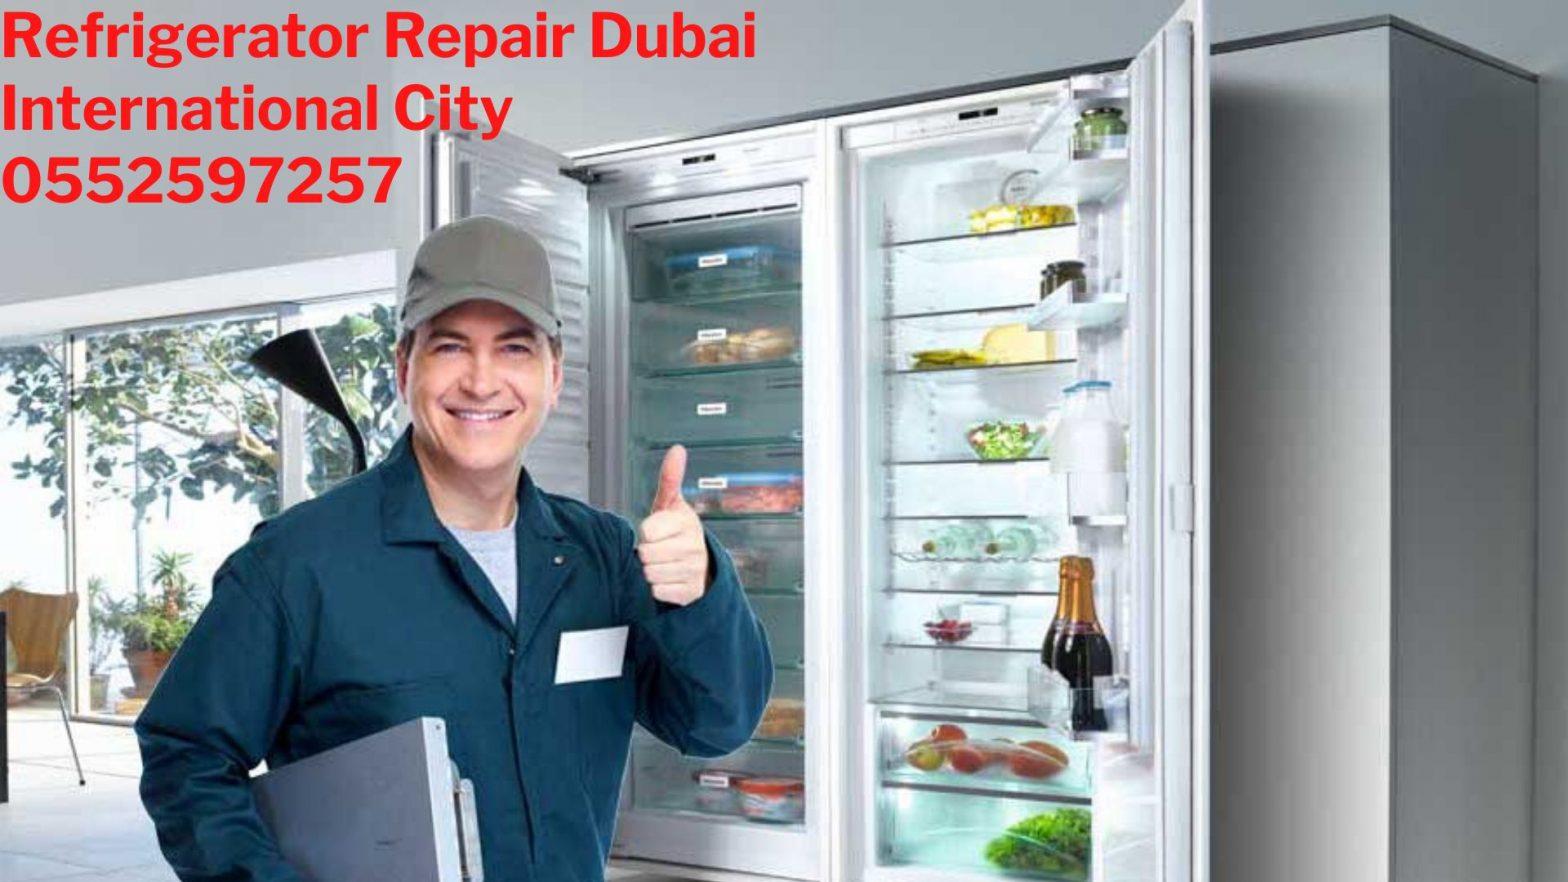 Refrigerator repair Dubai international city